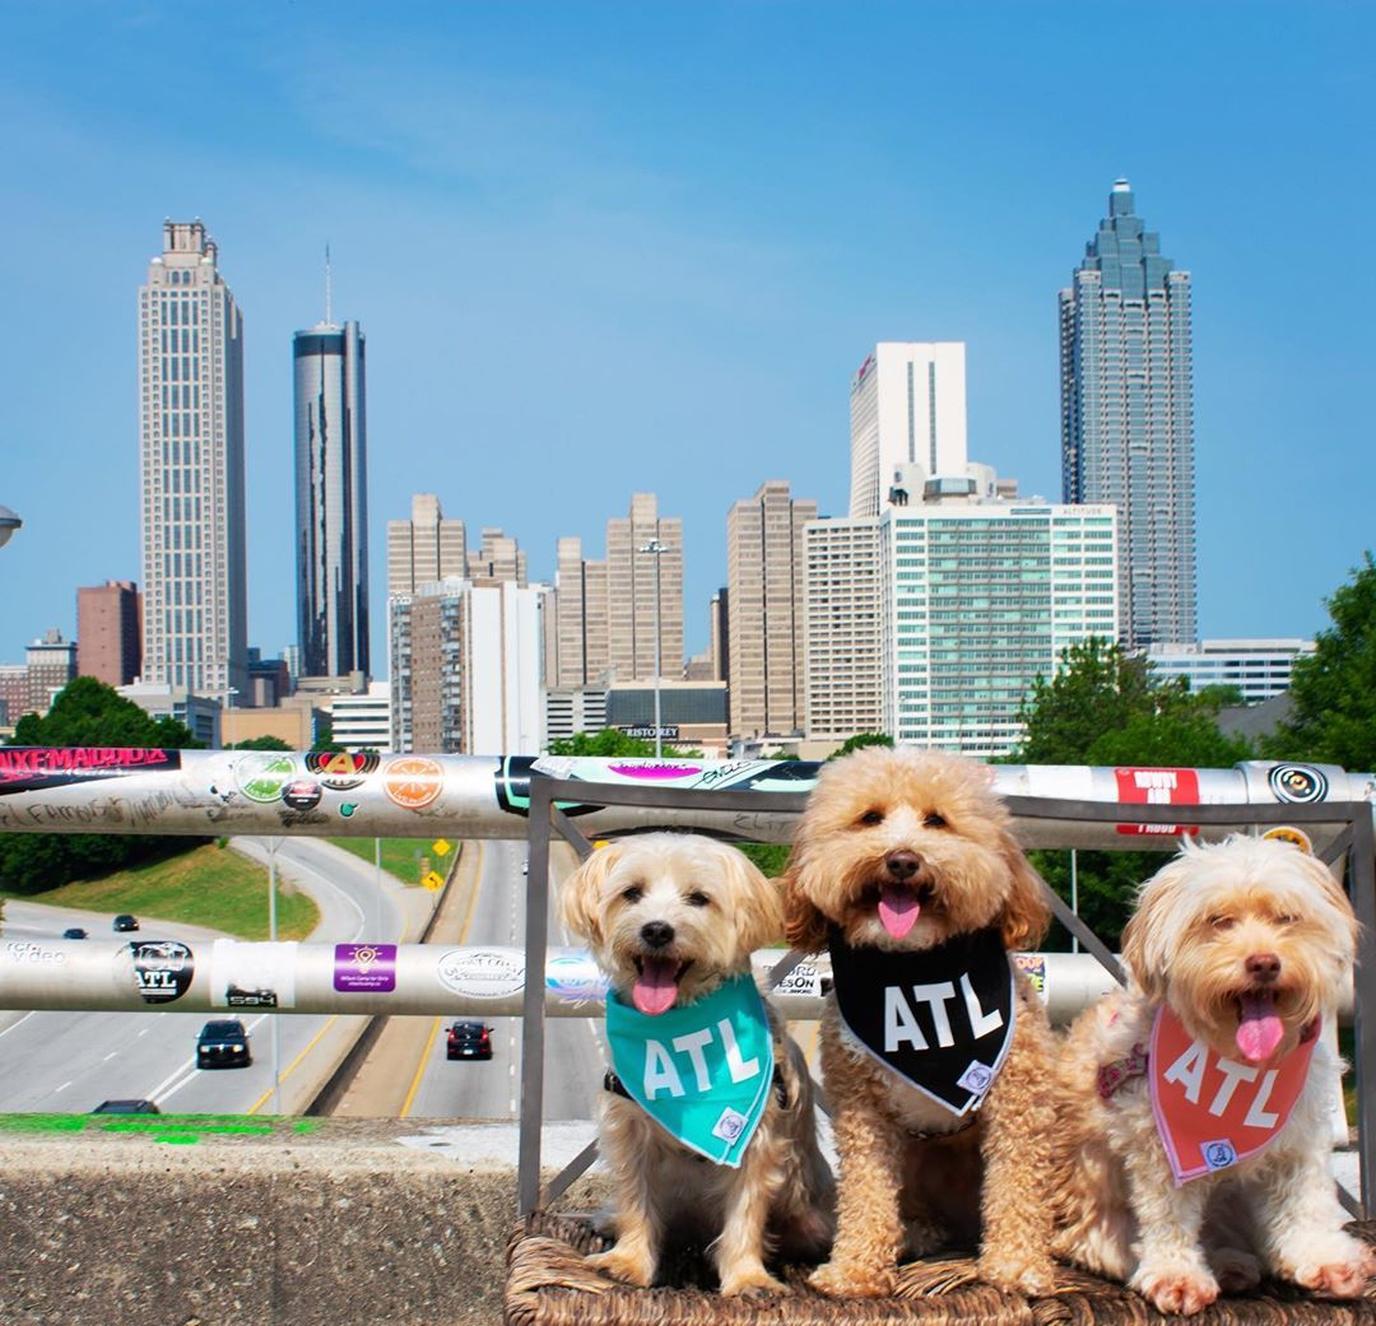 Bring your dog to dog-friendly Atlanta, GA.